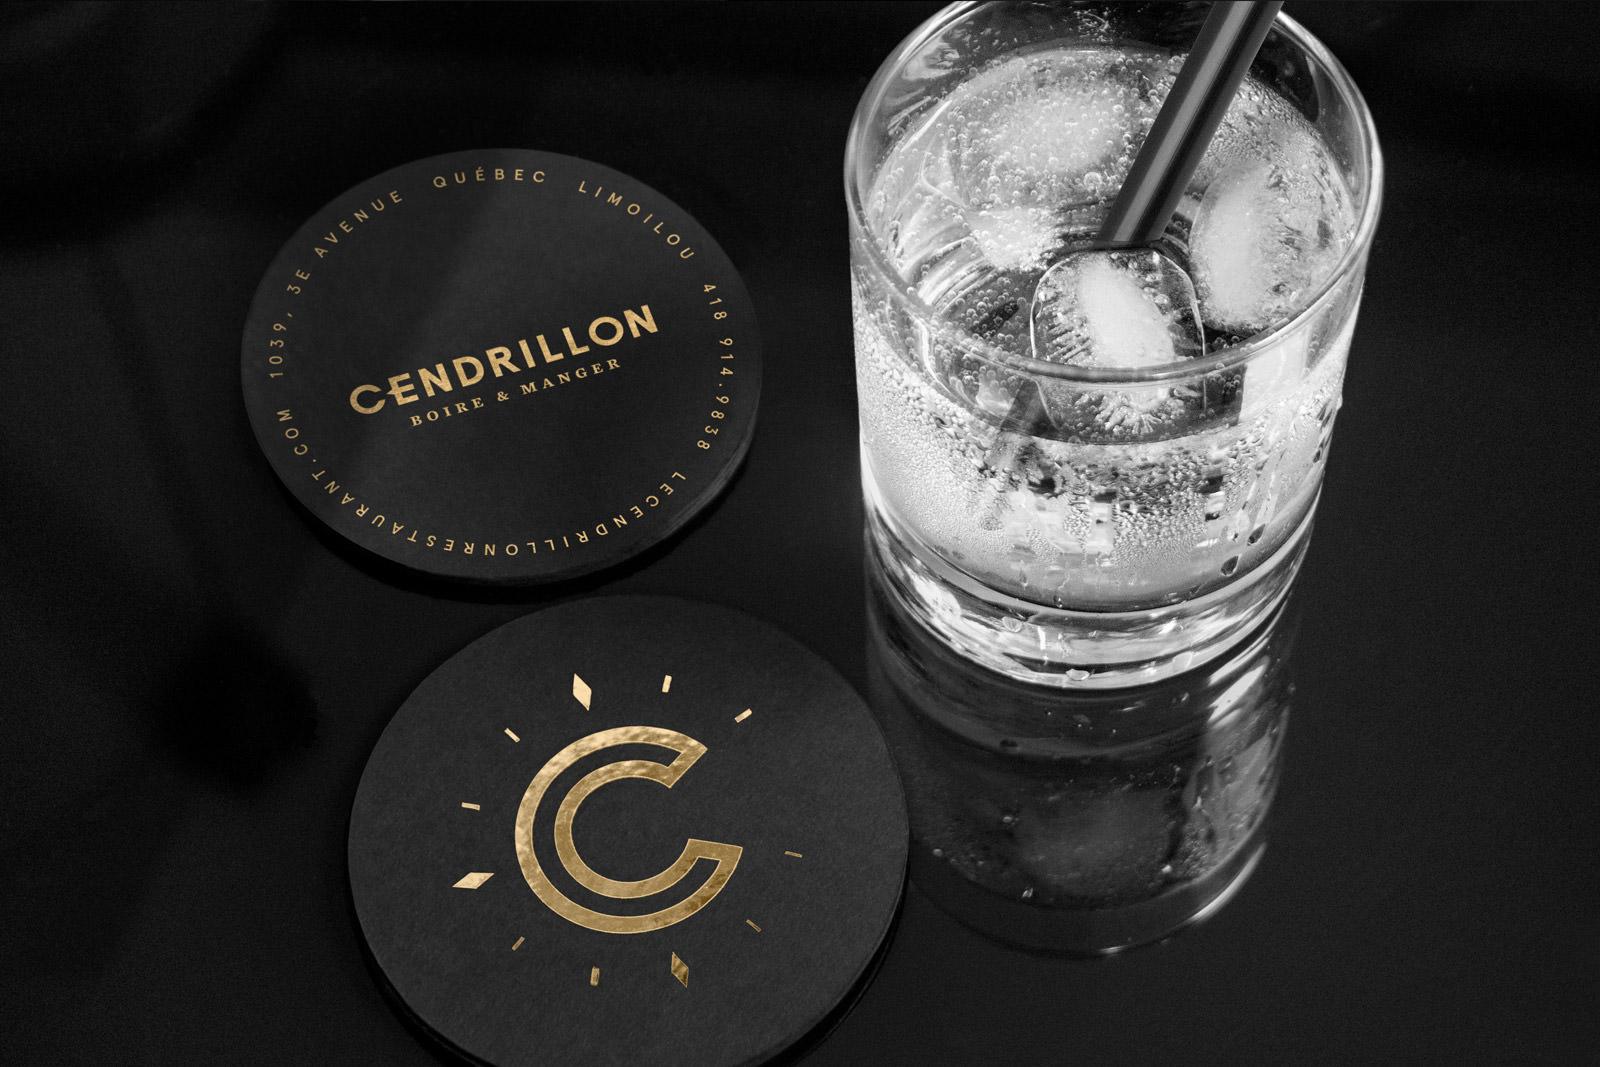 Figure-Jeremy-Hall-Design-Graphique-Logo-Branding-Image-De-Marque-Cendrillon-Restaurant-6.jpg